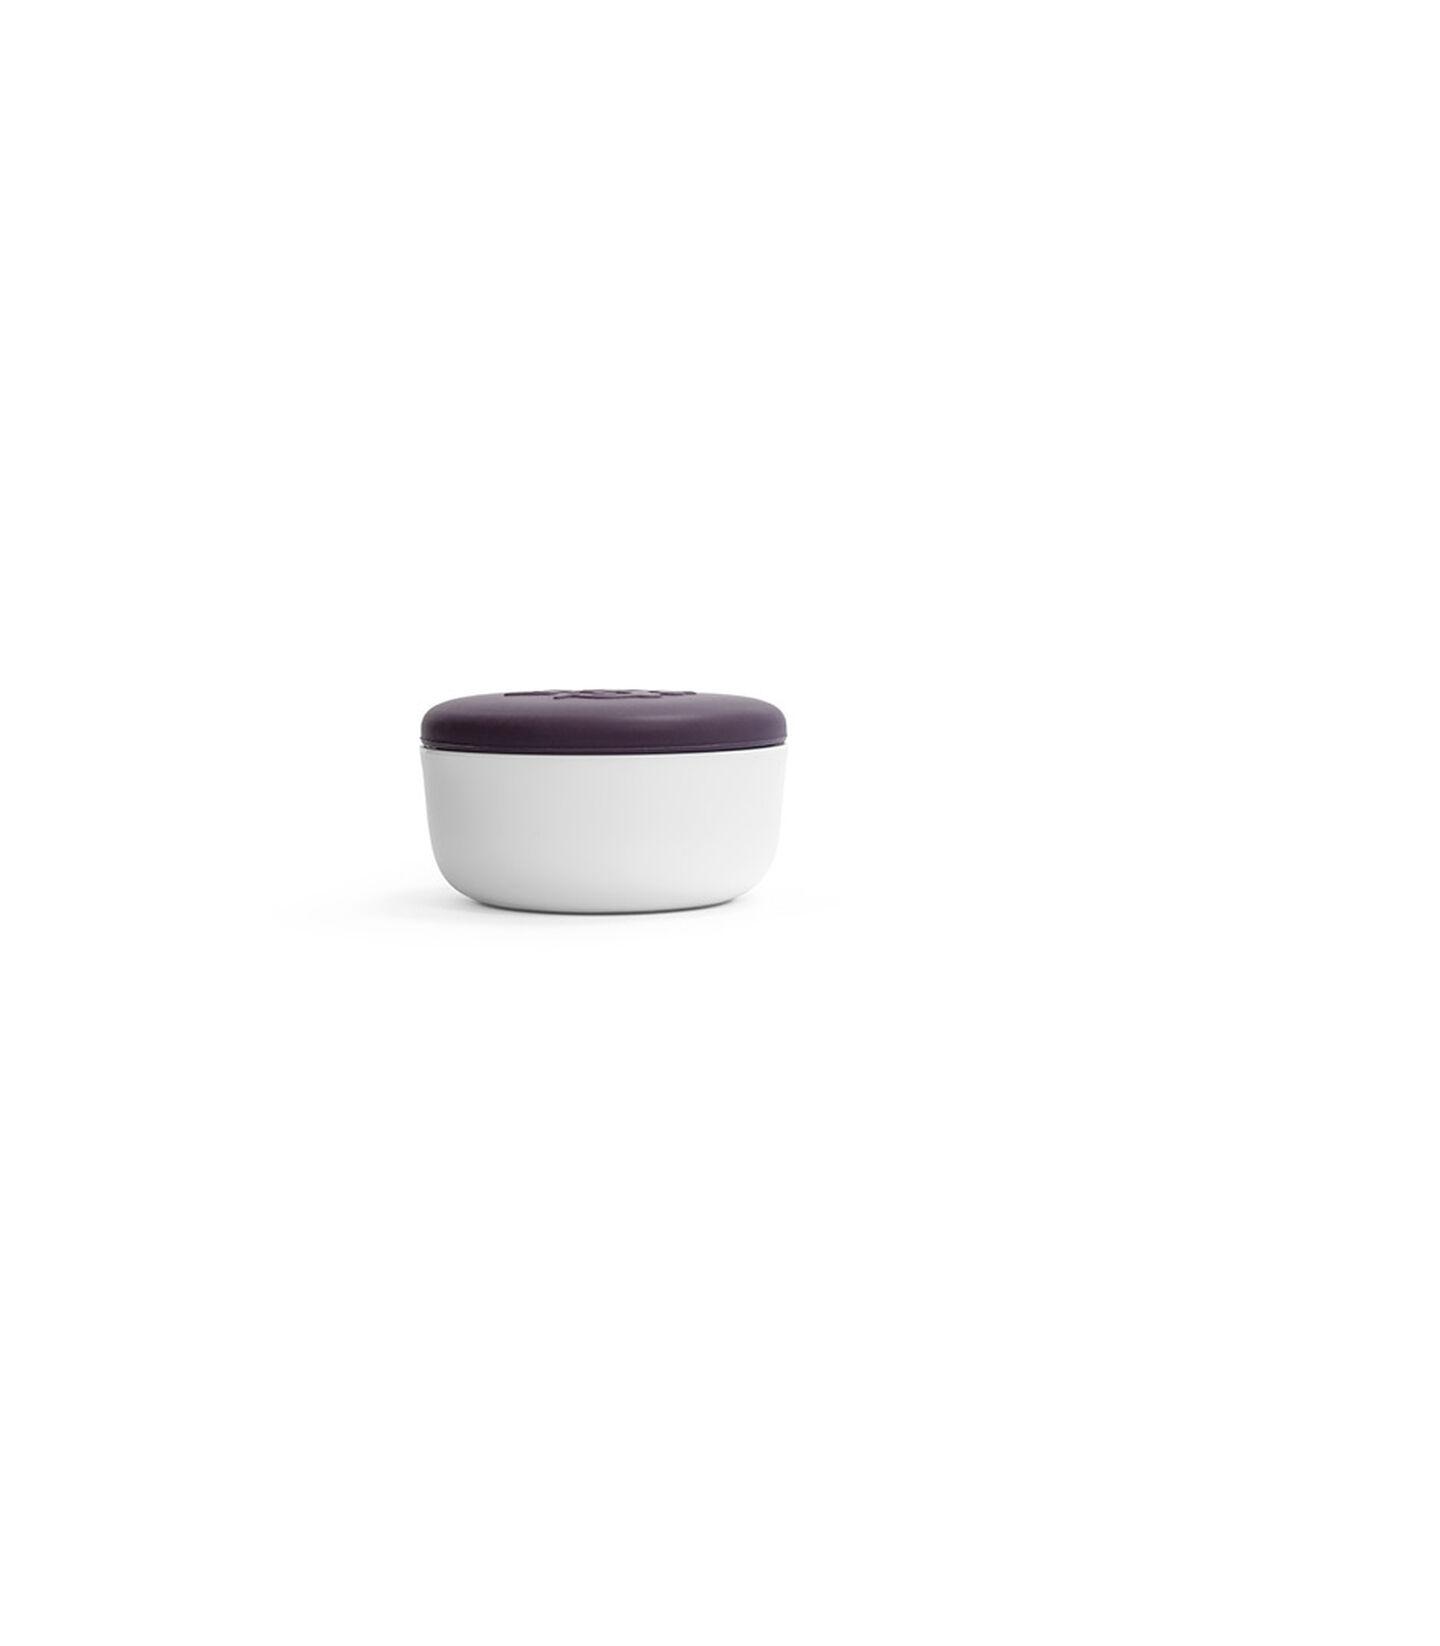 Stokke™ Munch Bowl with lid. Tableware.  view 2